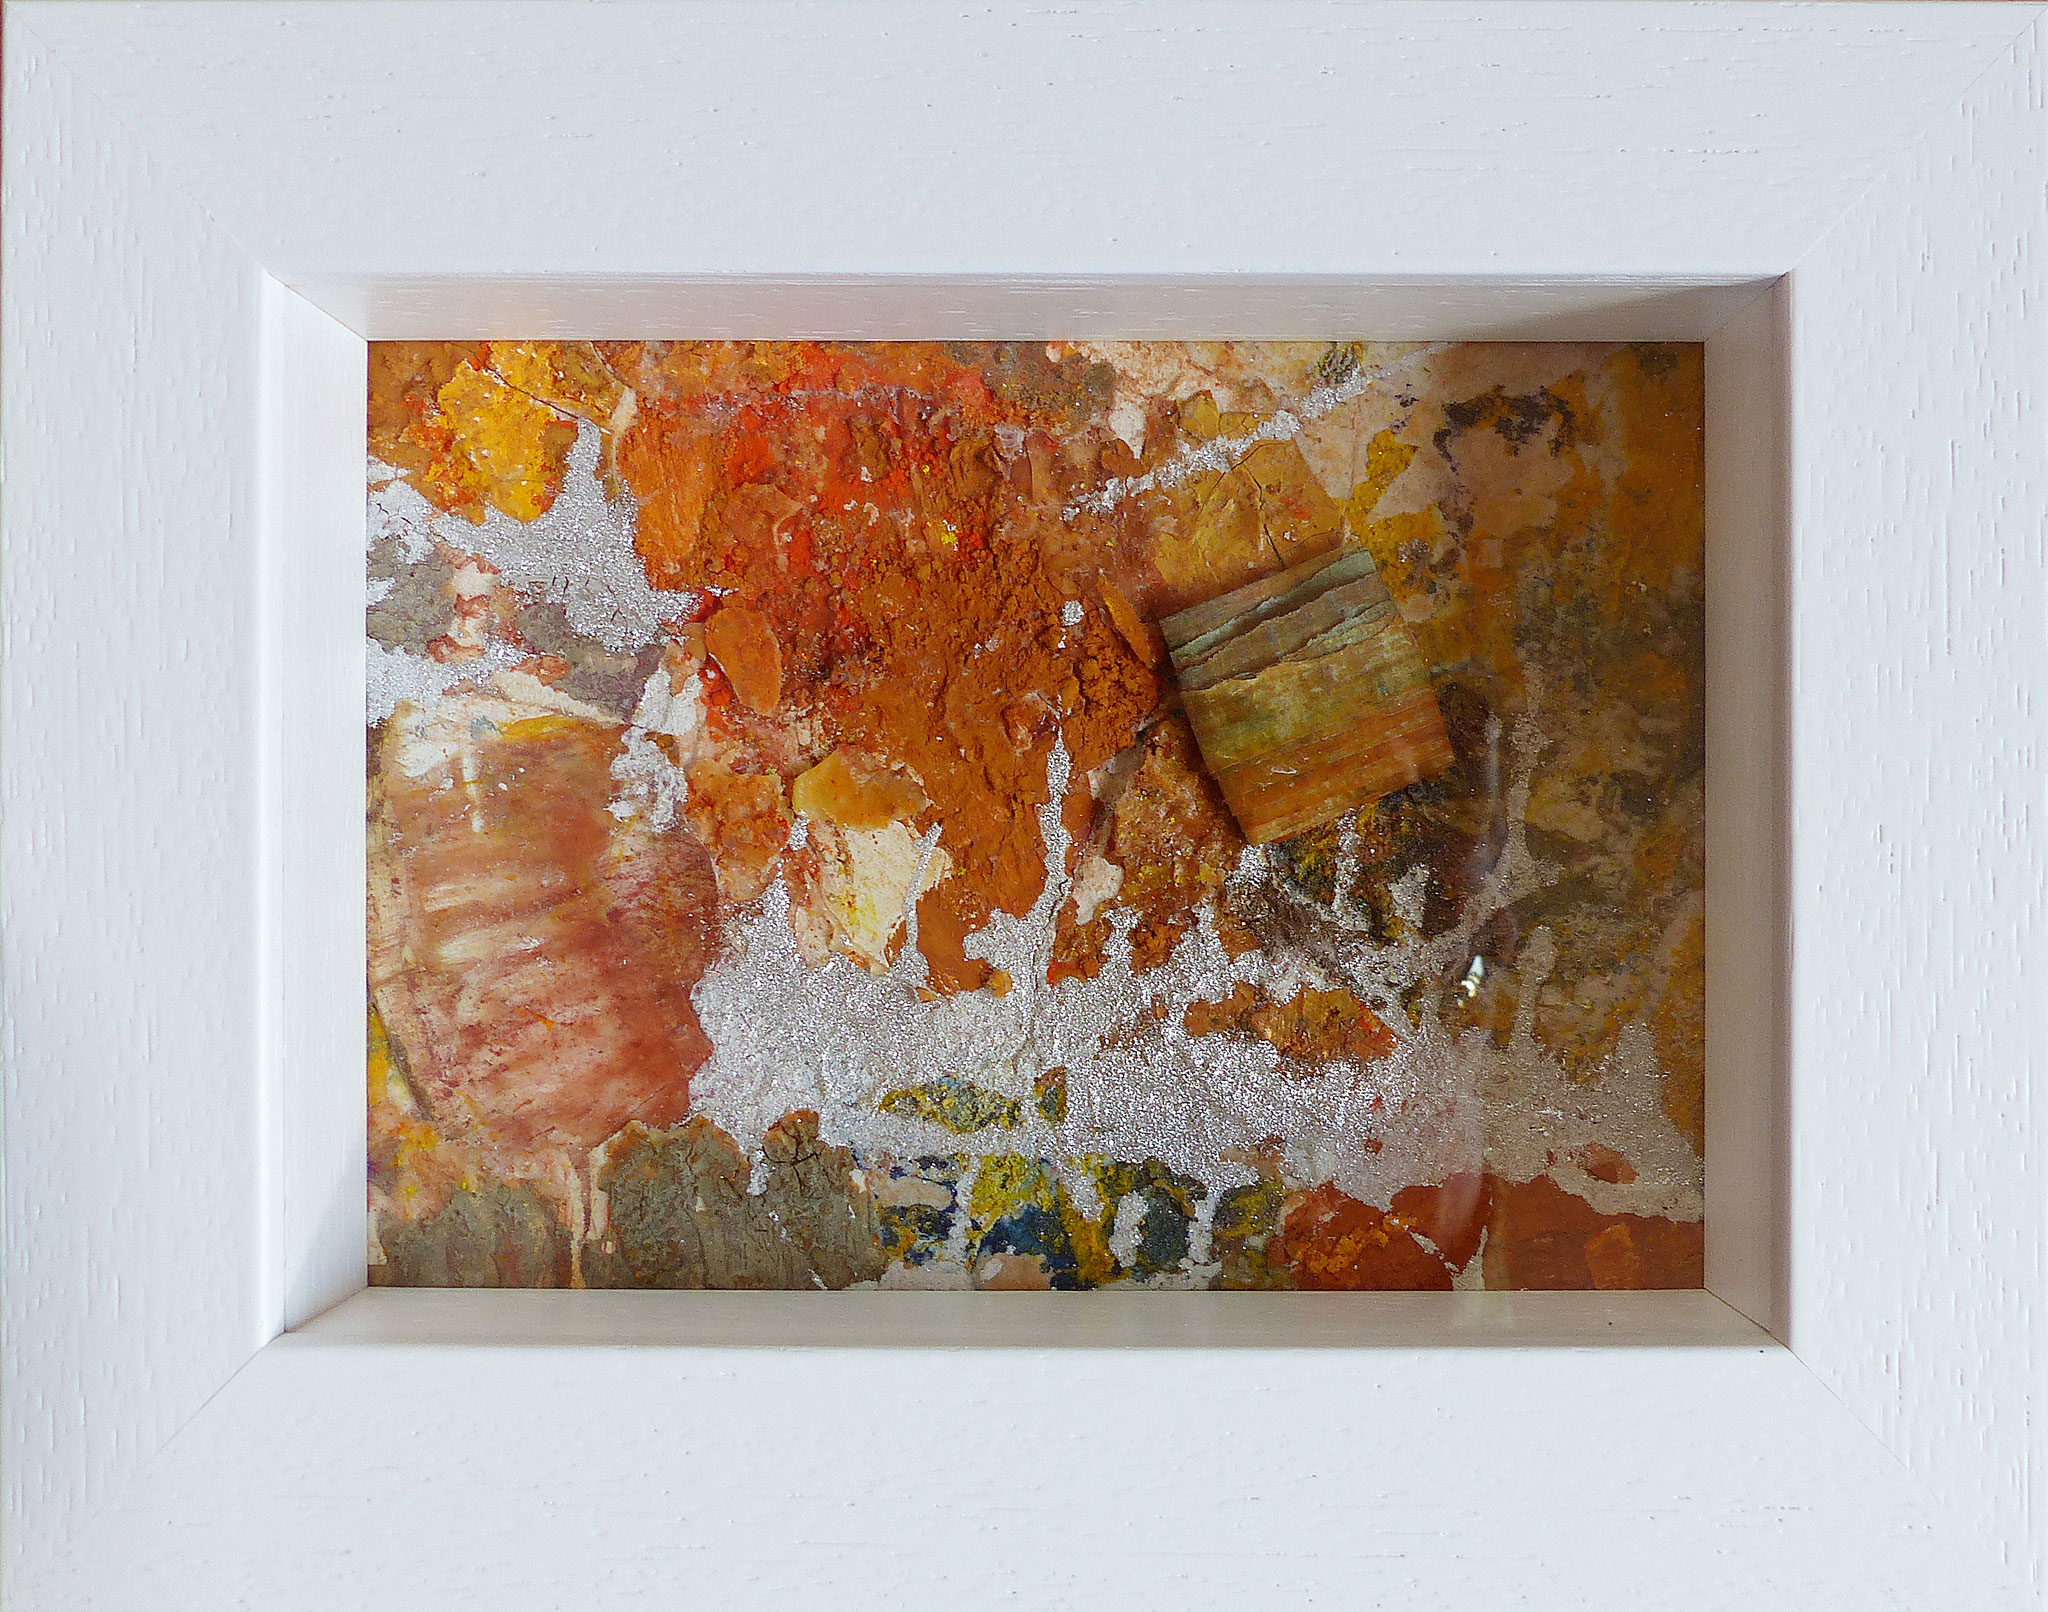 Papperlapapp 8, Acrylmischtechnik, 23 x 18 mit Rahmen, 2017,  verkauft